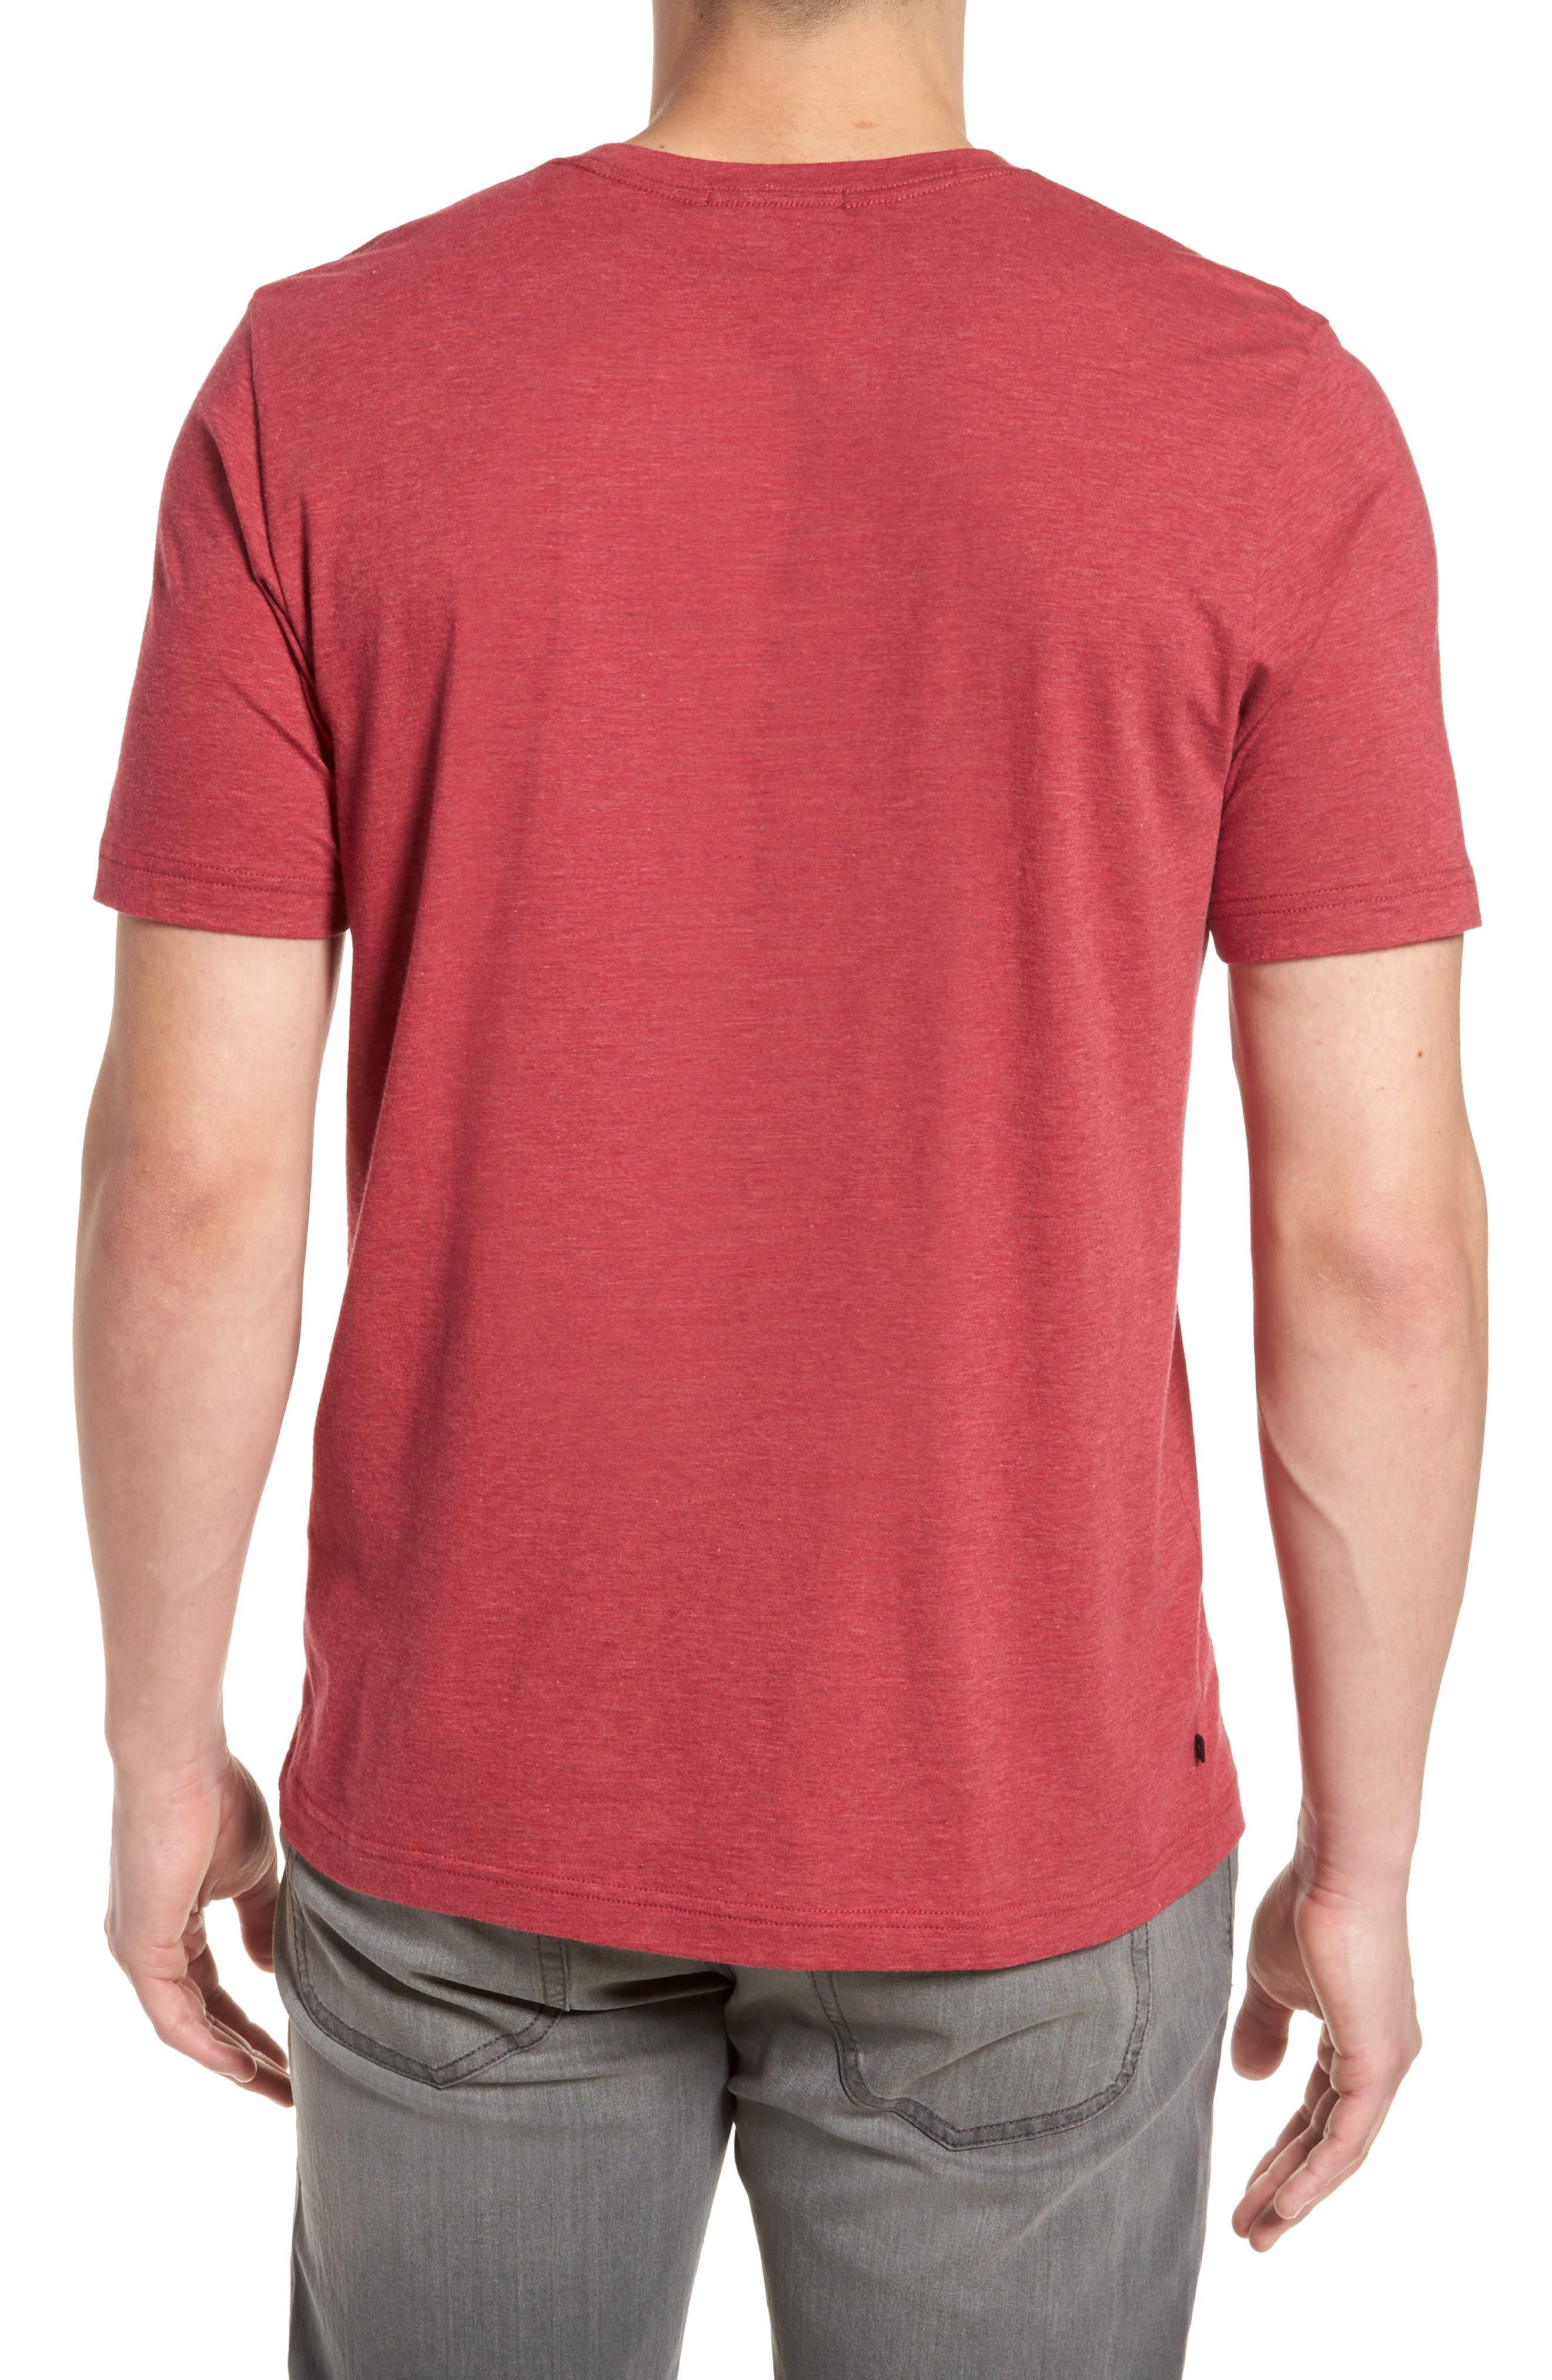 Hedrick T-Shirt,                             Alternate thumbnail 2, color,                             Heather Ox Blood